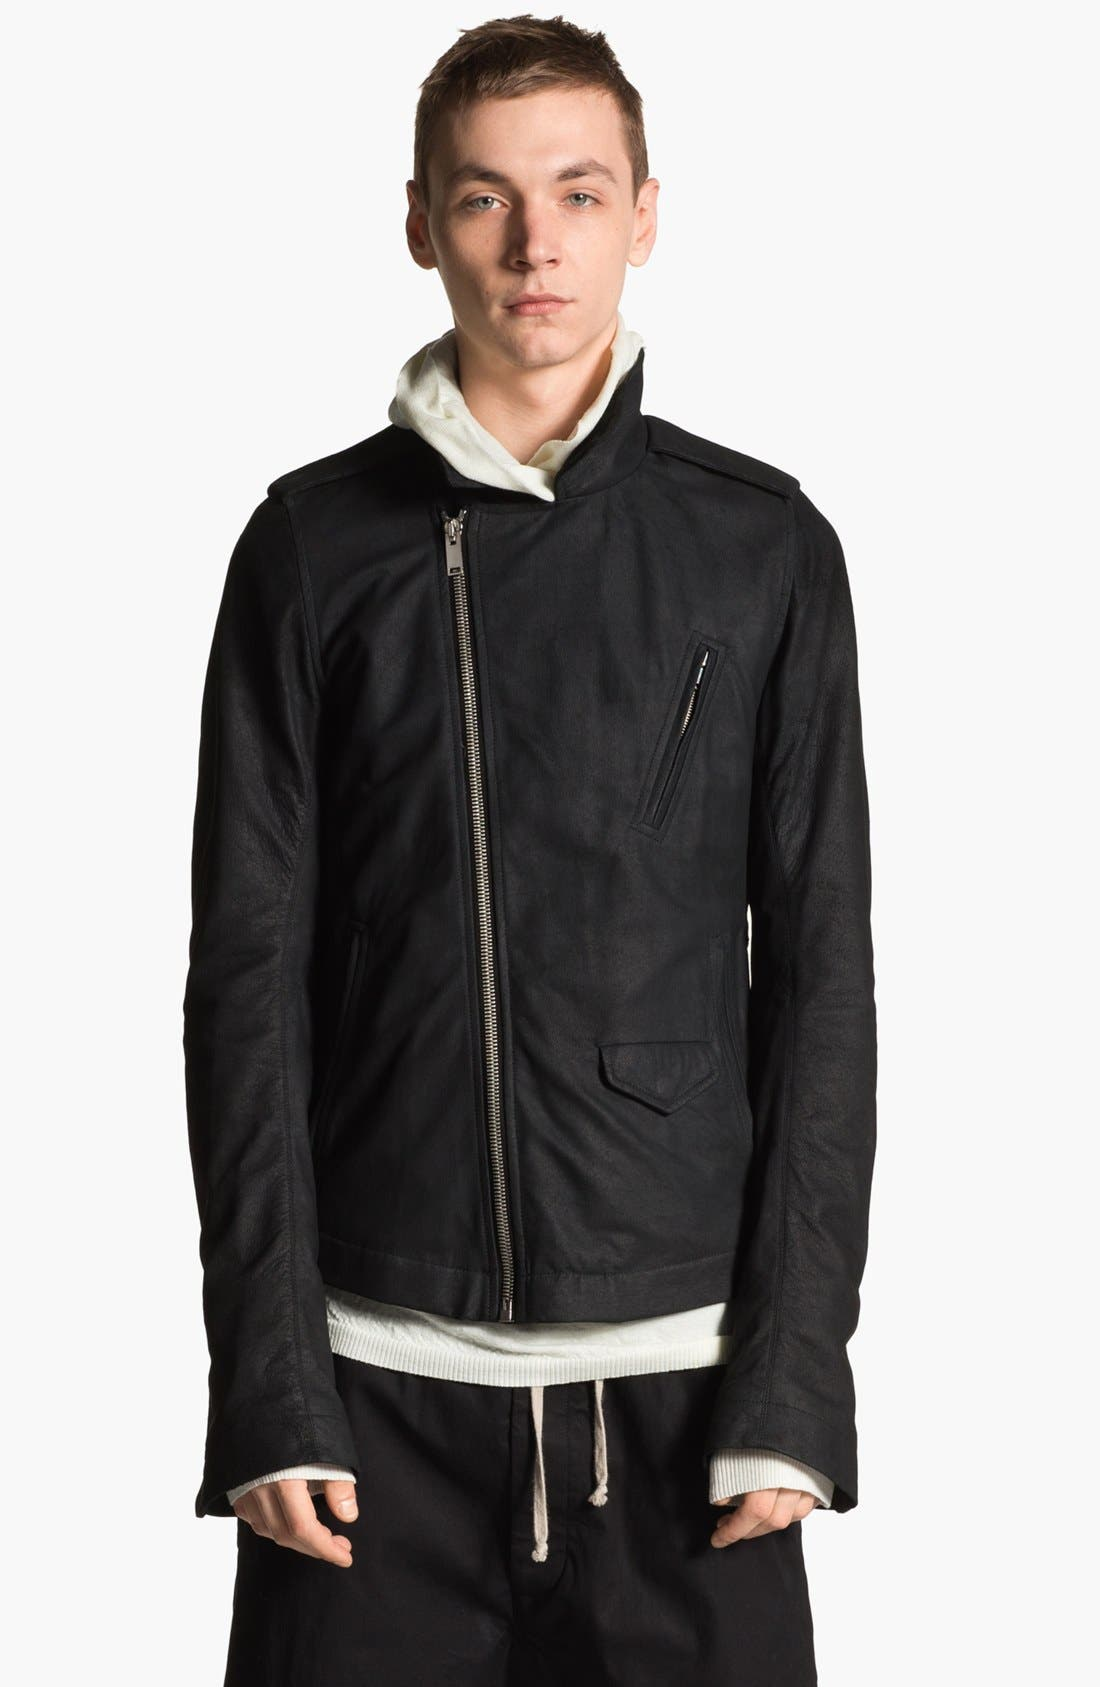 Alternate Image 1 Selected - Rick Owens Lambskin Leather Biker Jacket